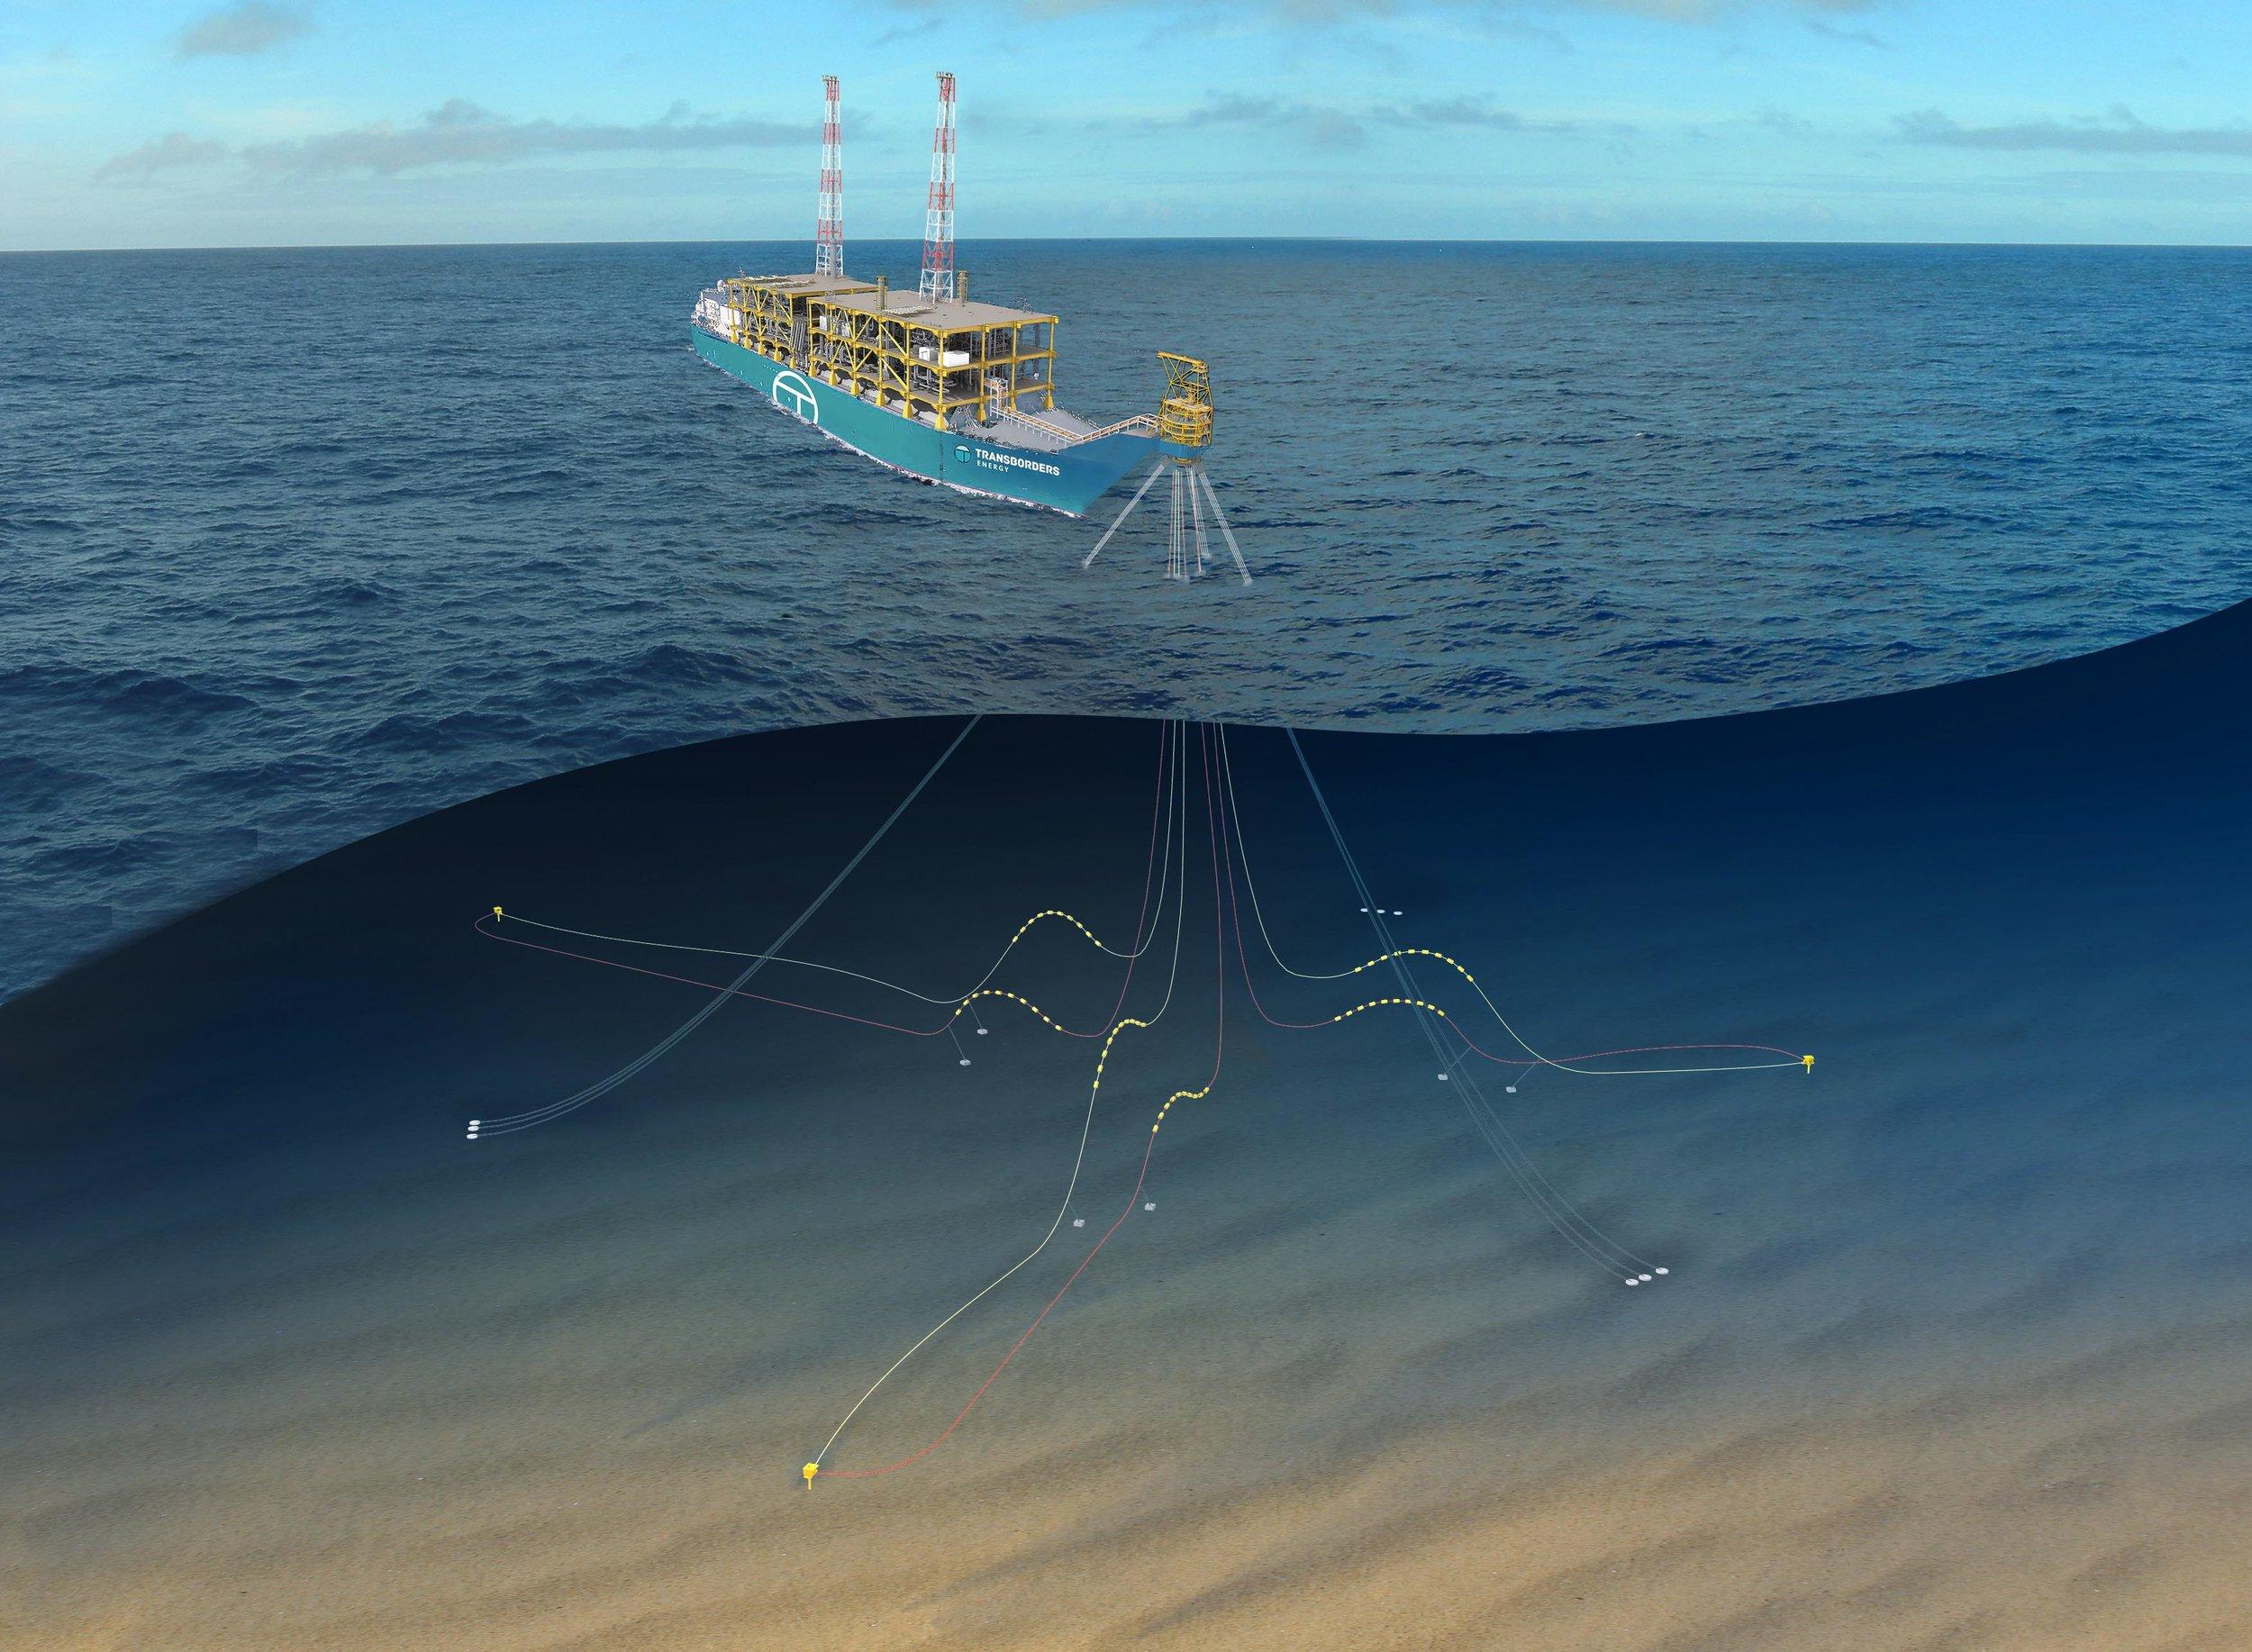 Photo courtesy of Transborders Energy: Initial field development plan utilising Transborders Energy's Generic FLNG Solution